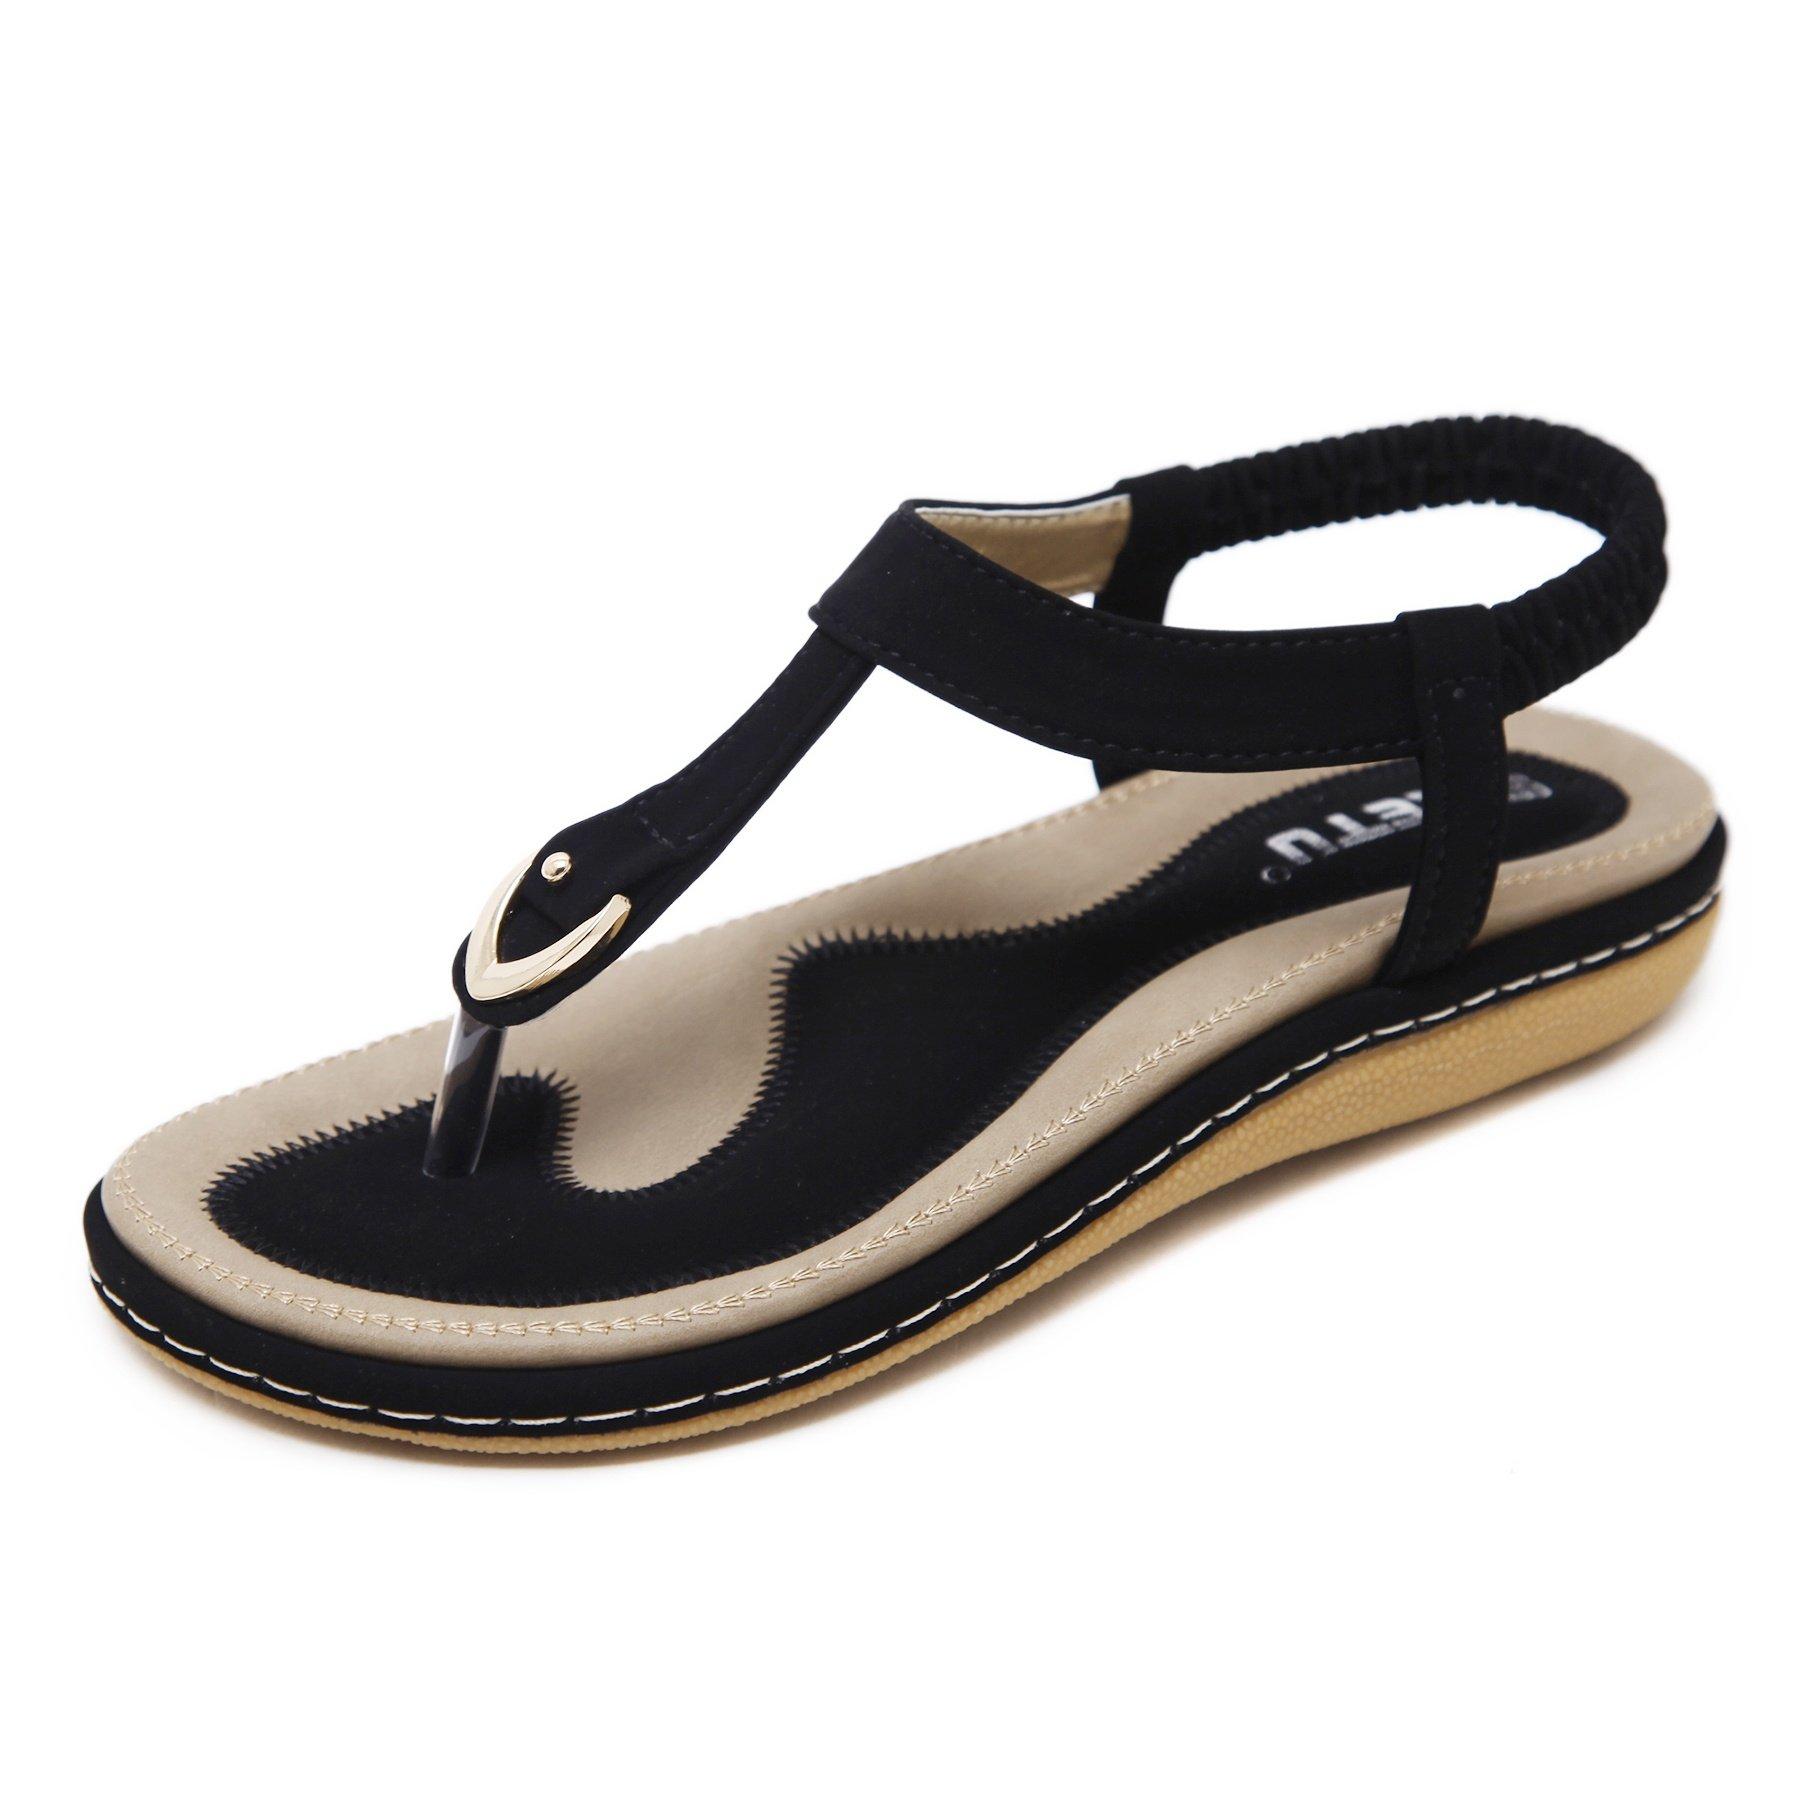 Wollanlily Women Summer Beach Flat Sandals T-Strap Elastic Ankle Strap Flip-Flop Thong Shoes Black-01 US 8.5